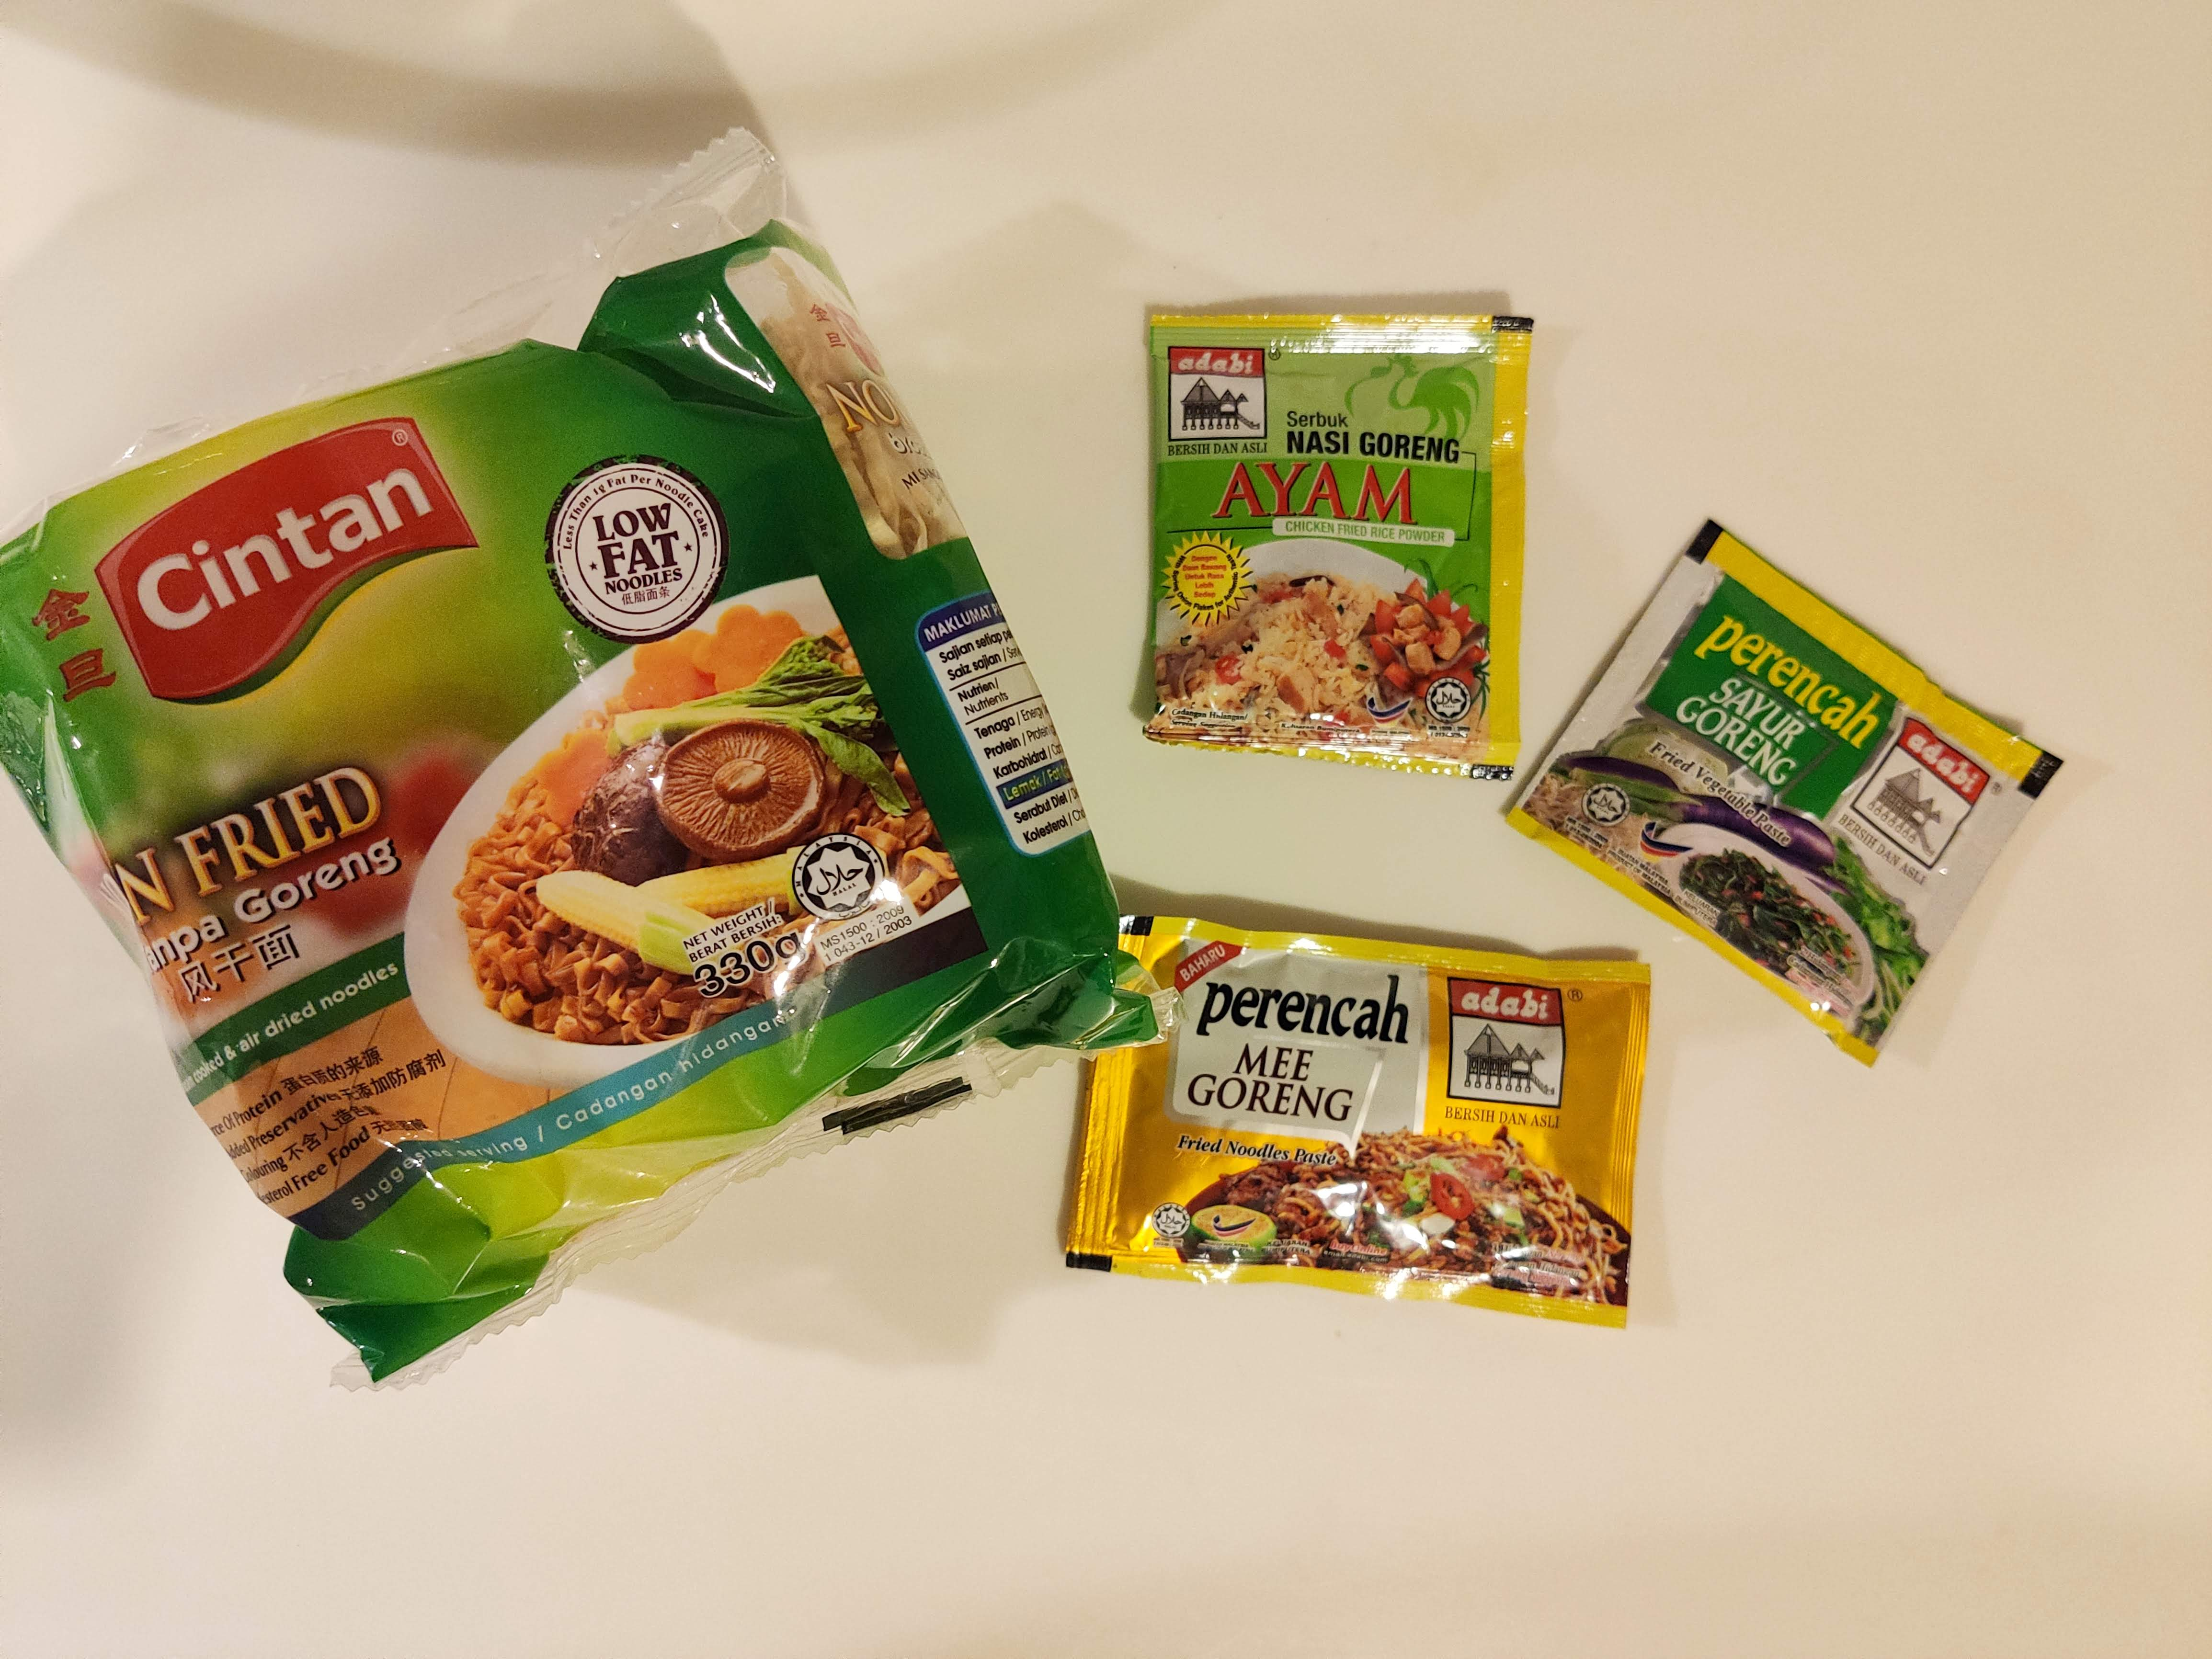 マレーシア調味料